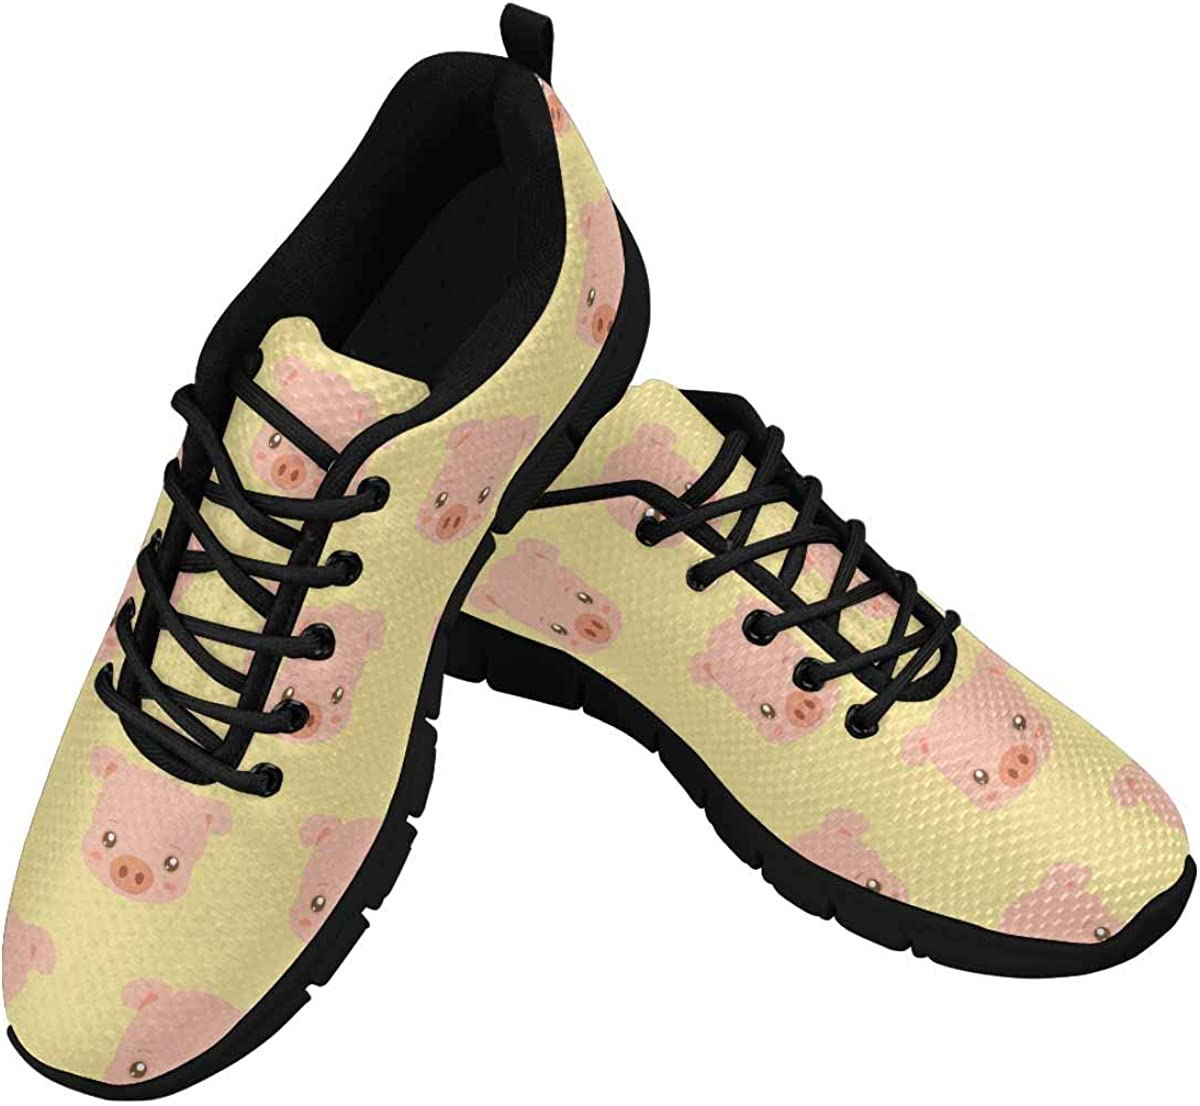 InterestPrint Pig Face Women's Athletic Walking Running Sneakers Comfortable Lightweight Shoes